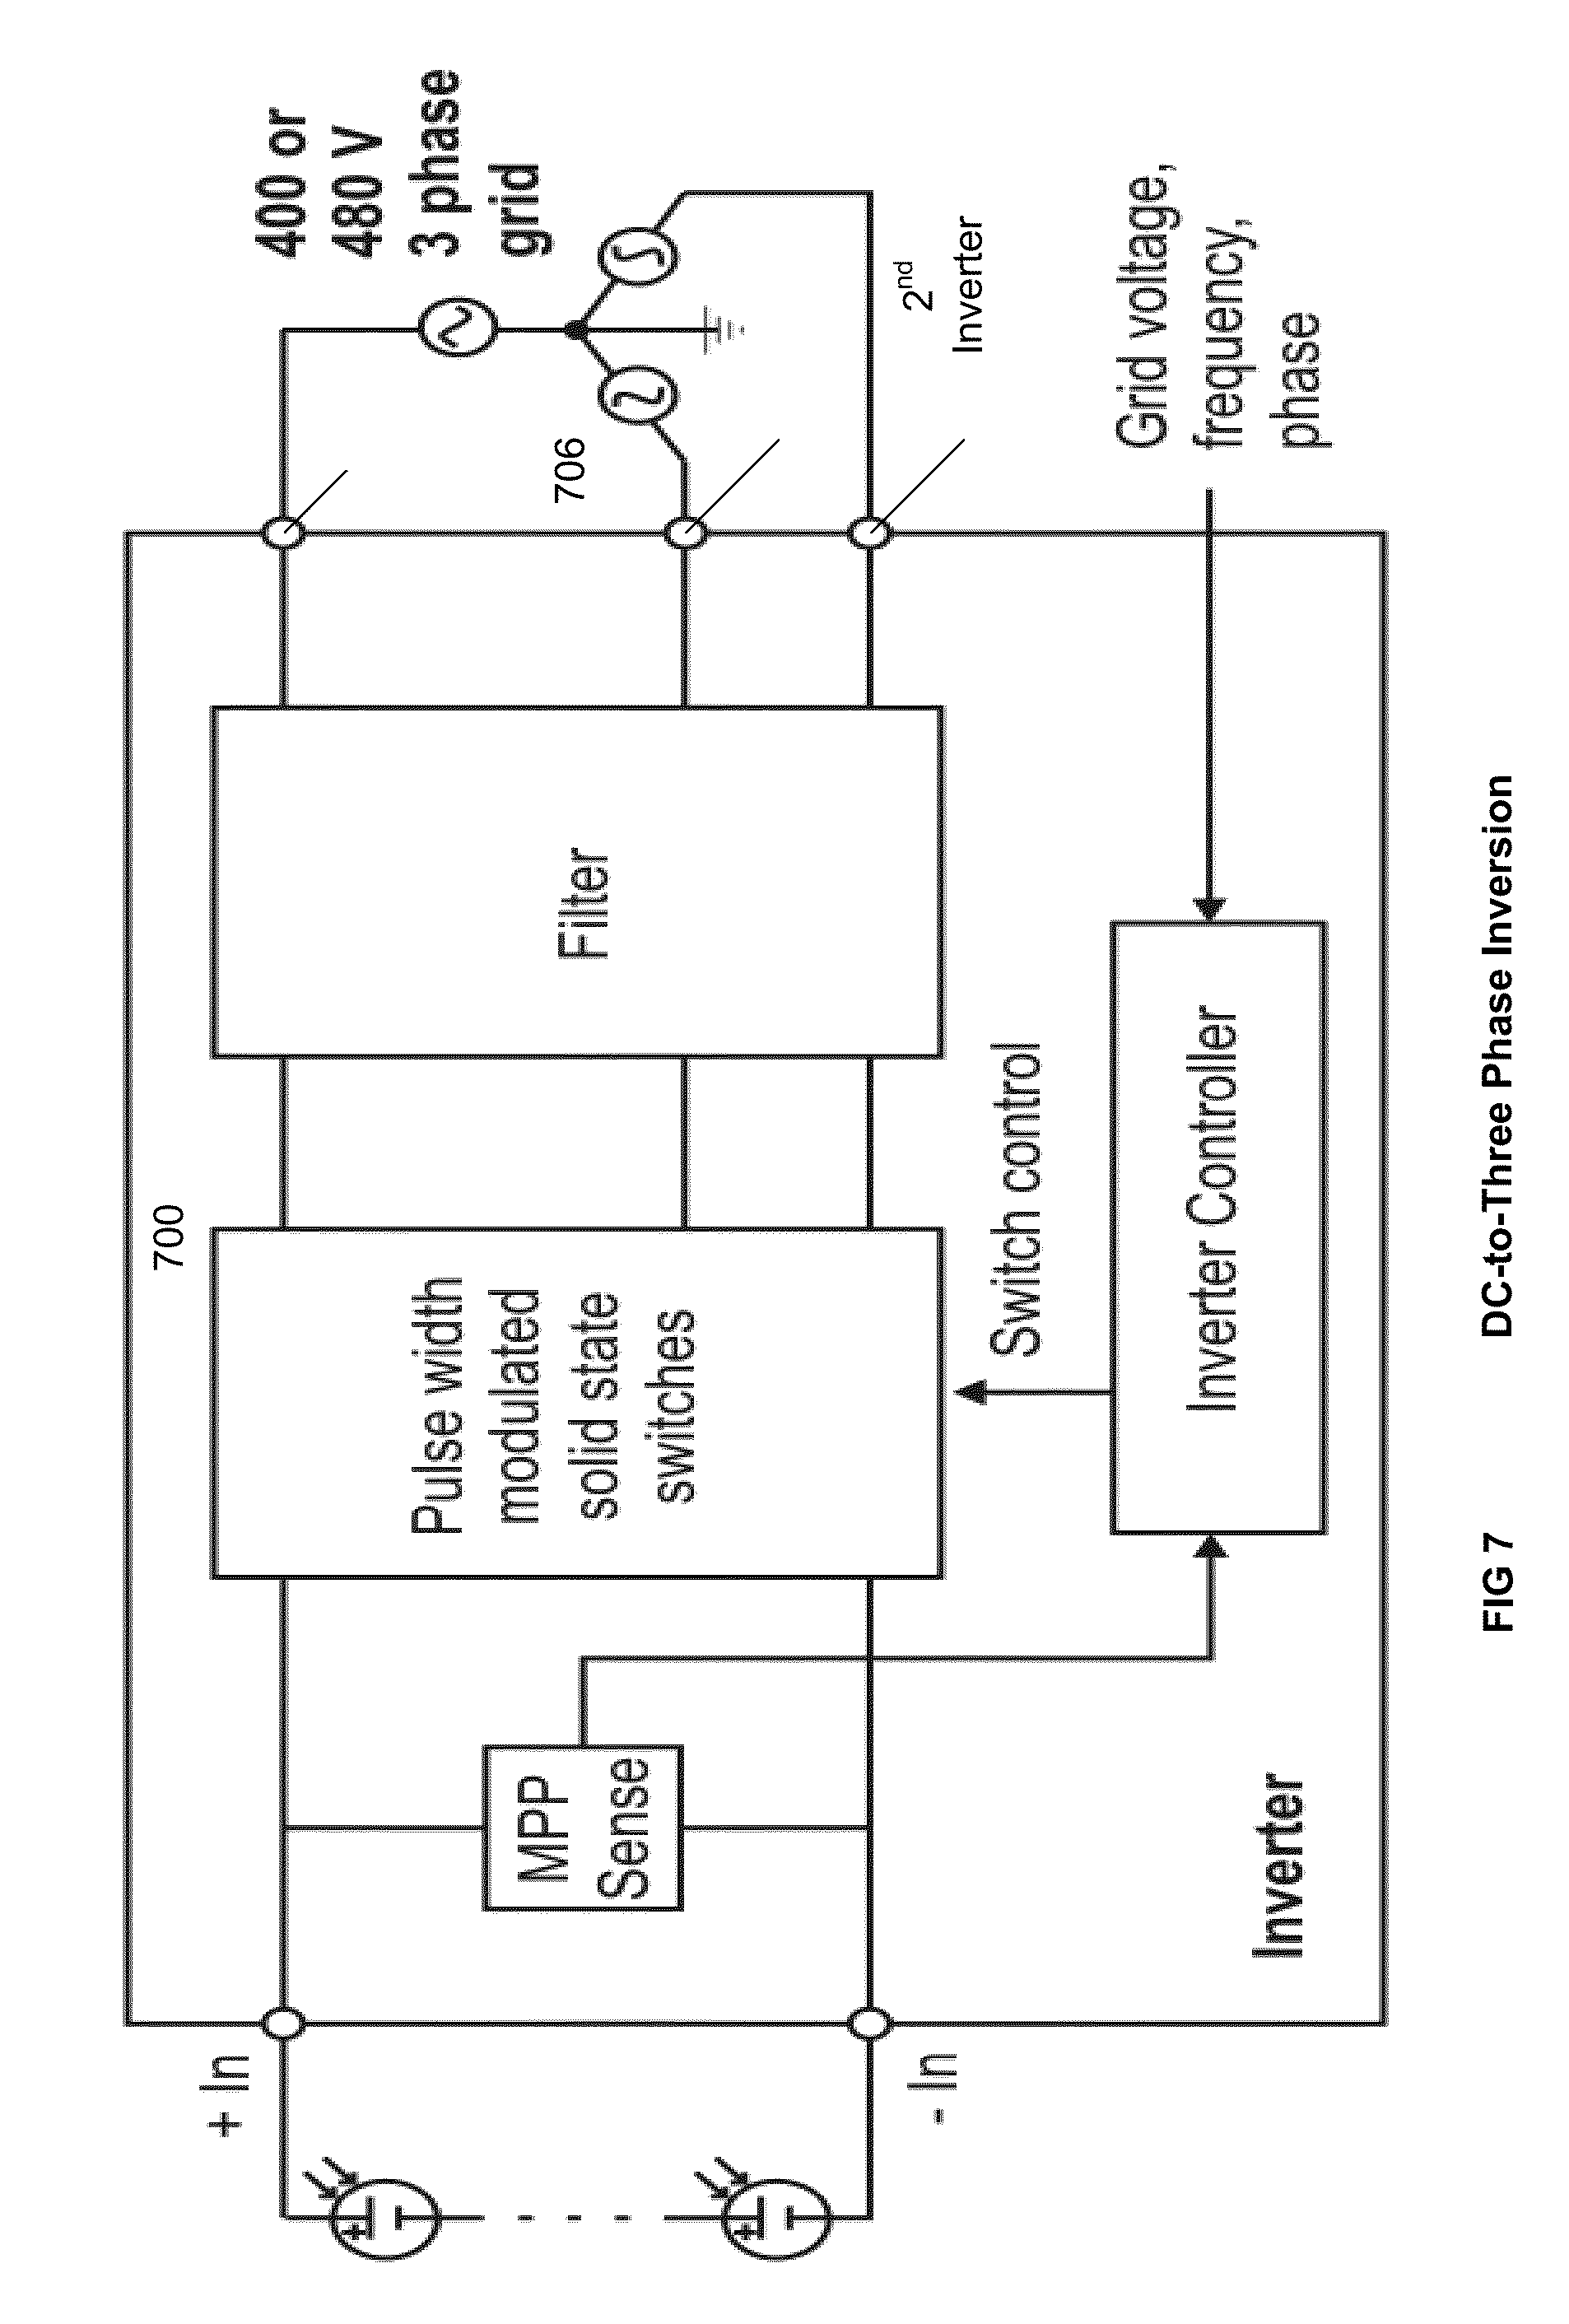 480 Volt 3 Phase European Wiring Diagram Diagrams Vac Three 2x12 4x12 Speaker 277 240